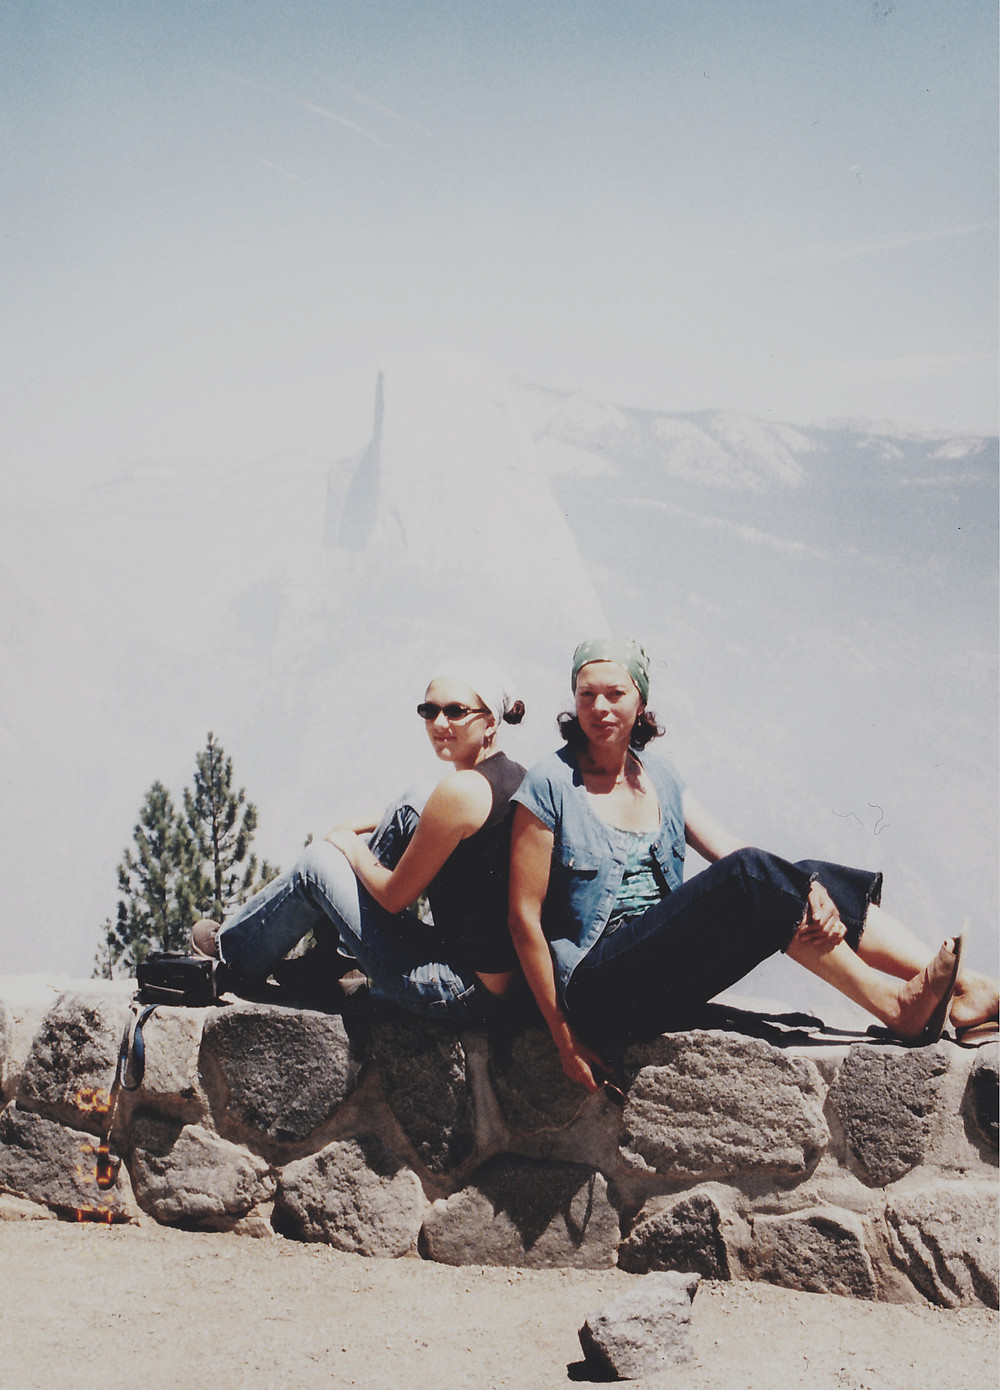 Half Dome Yosemite 2003.jpg